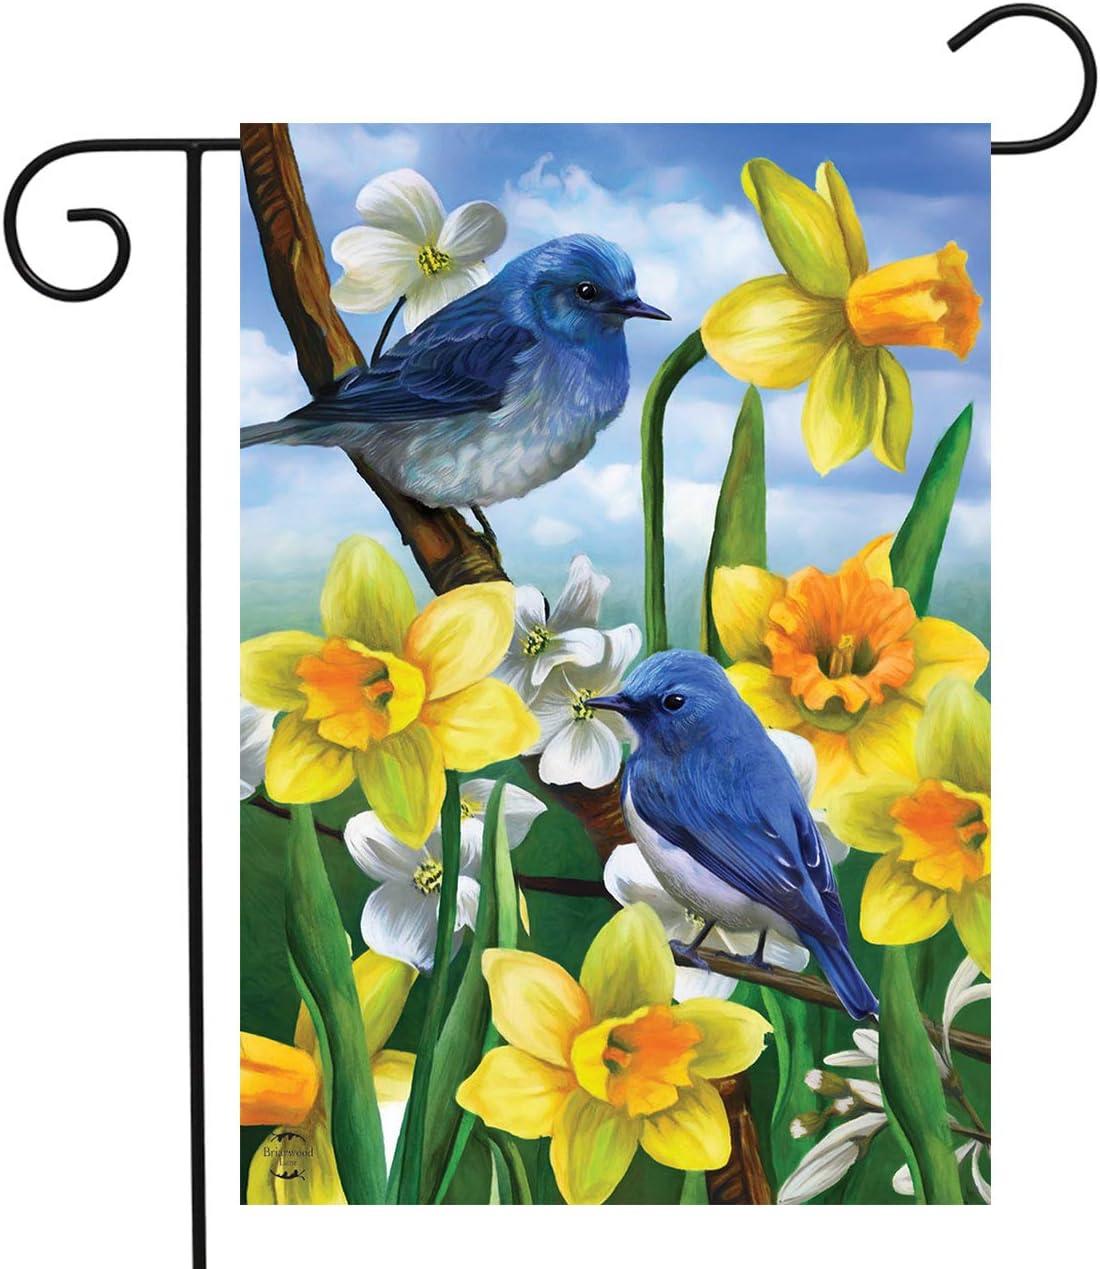 "Briarwood Lane Bluebirds and Daffodils Spring Garden Flag Floral 12.5"" x 18"""